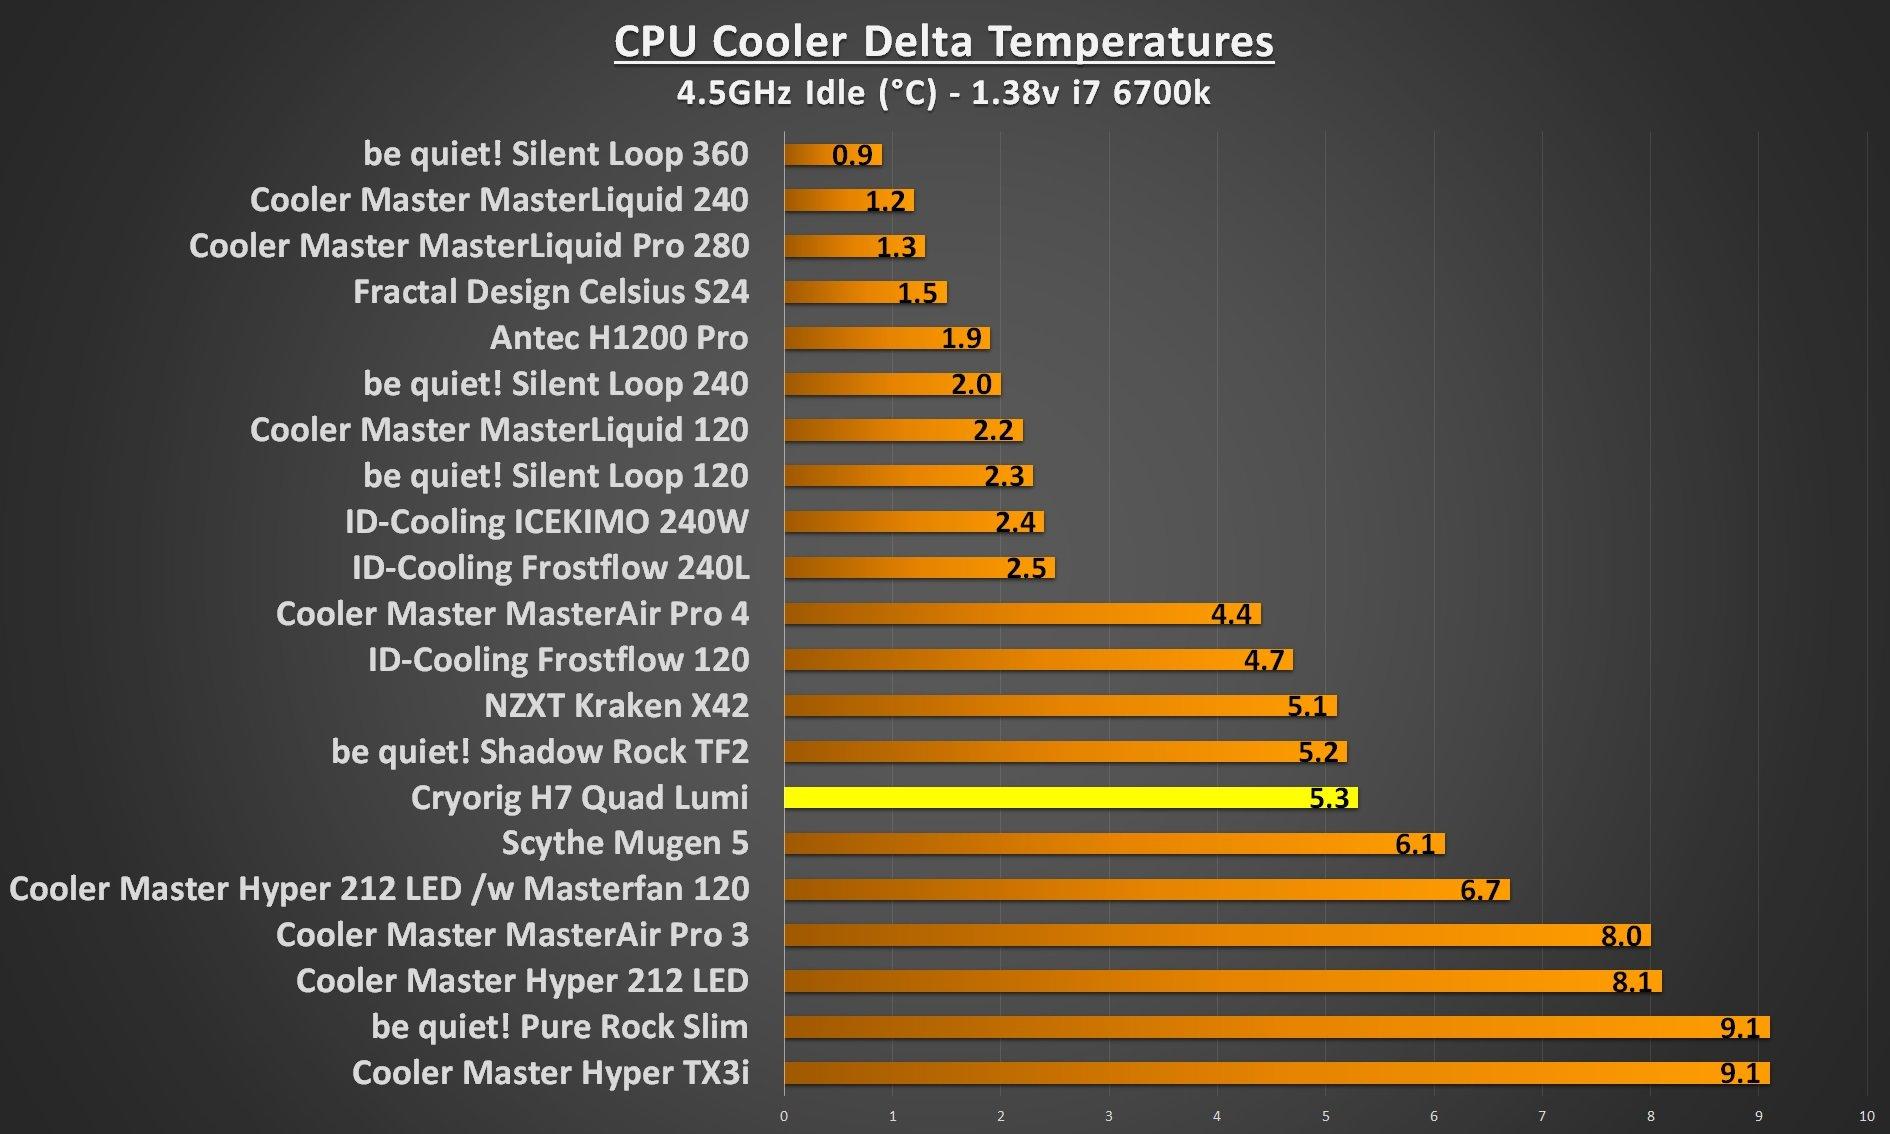 Cryorig H7 Quad Lumi 4.5Ghz idle